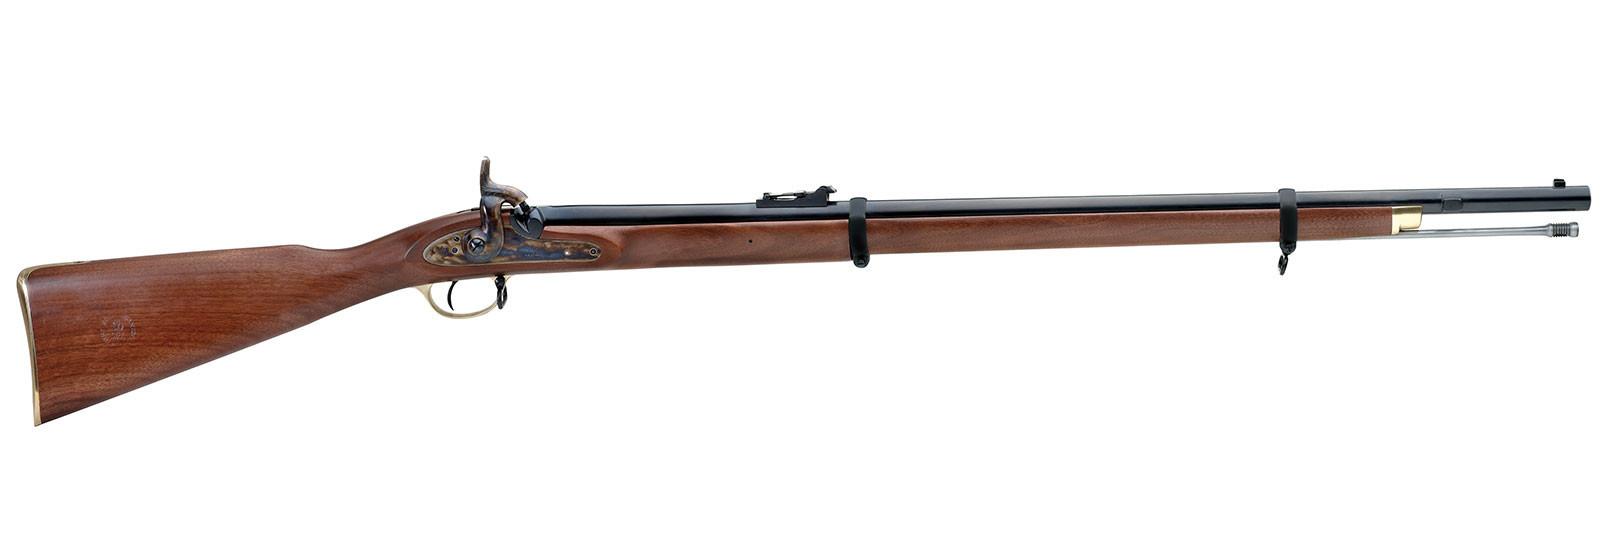 Enfield 2 band P1858 Rifle